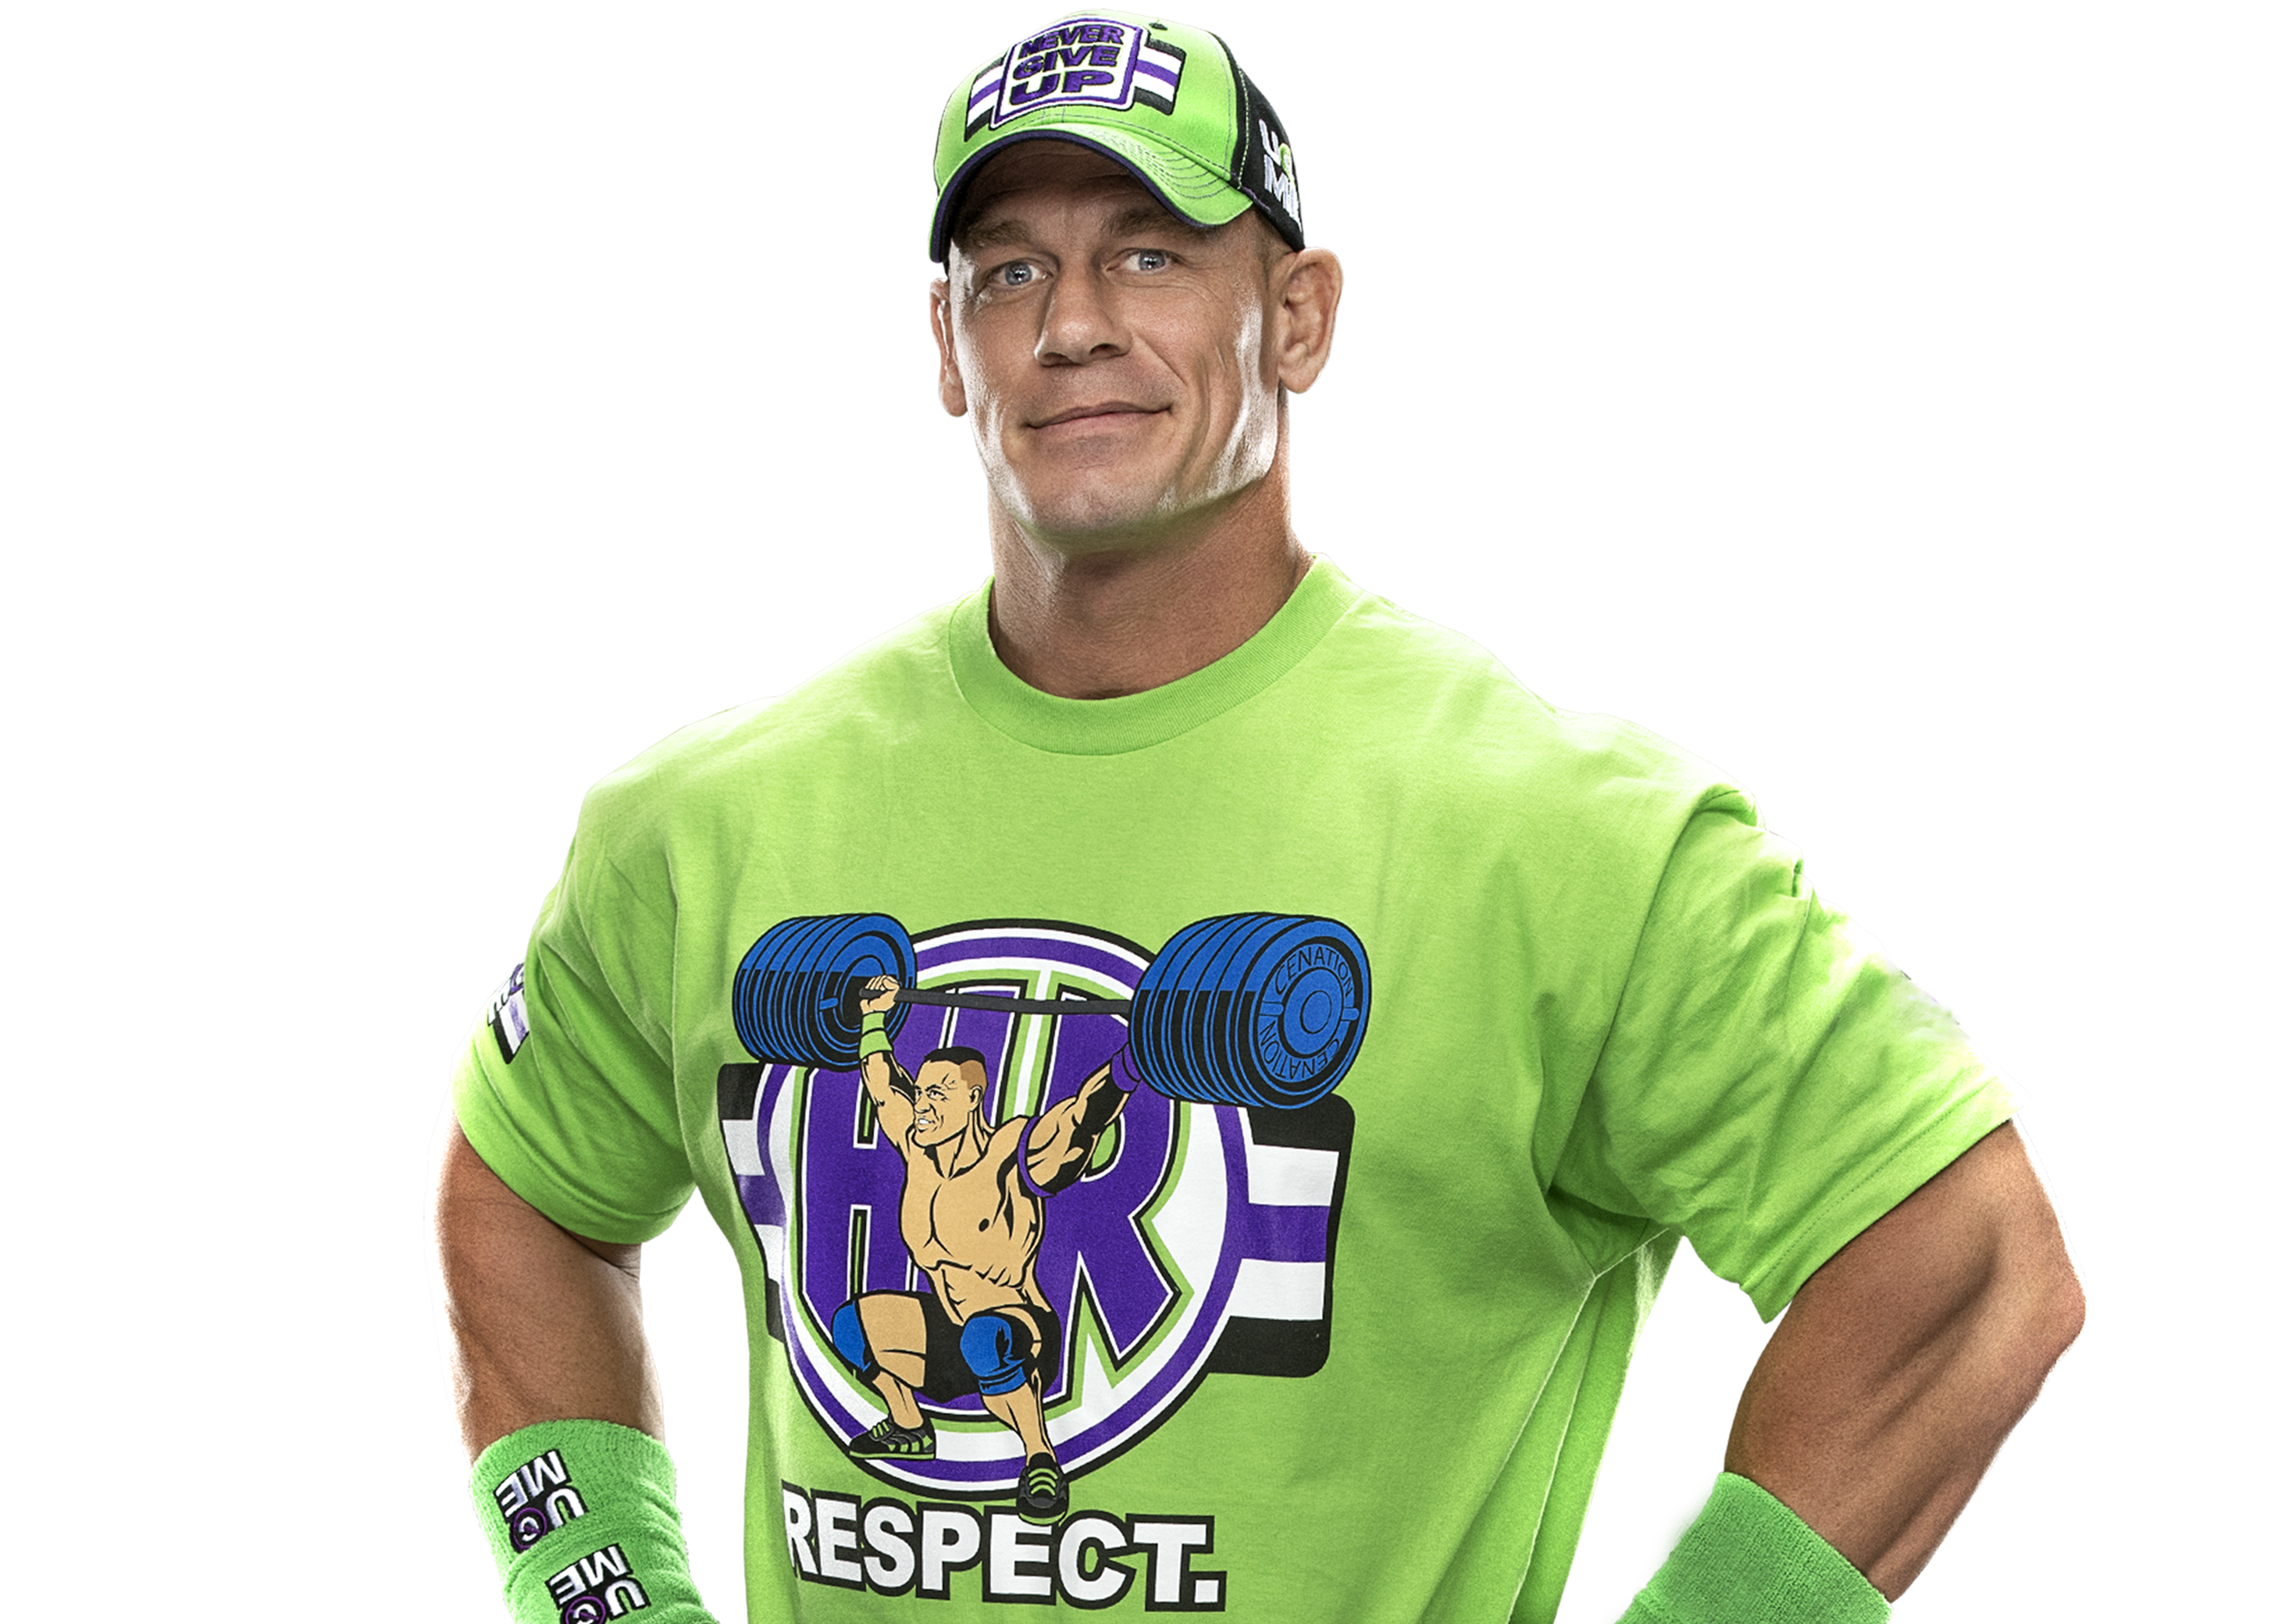 John Cena John Cena Superstar Wwe Superstar John Cena